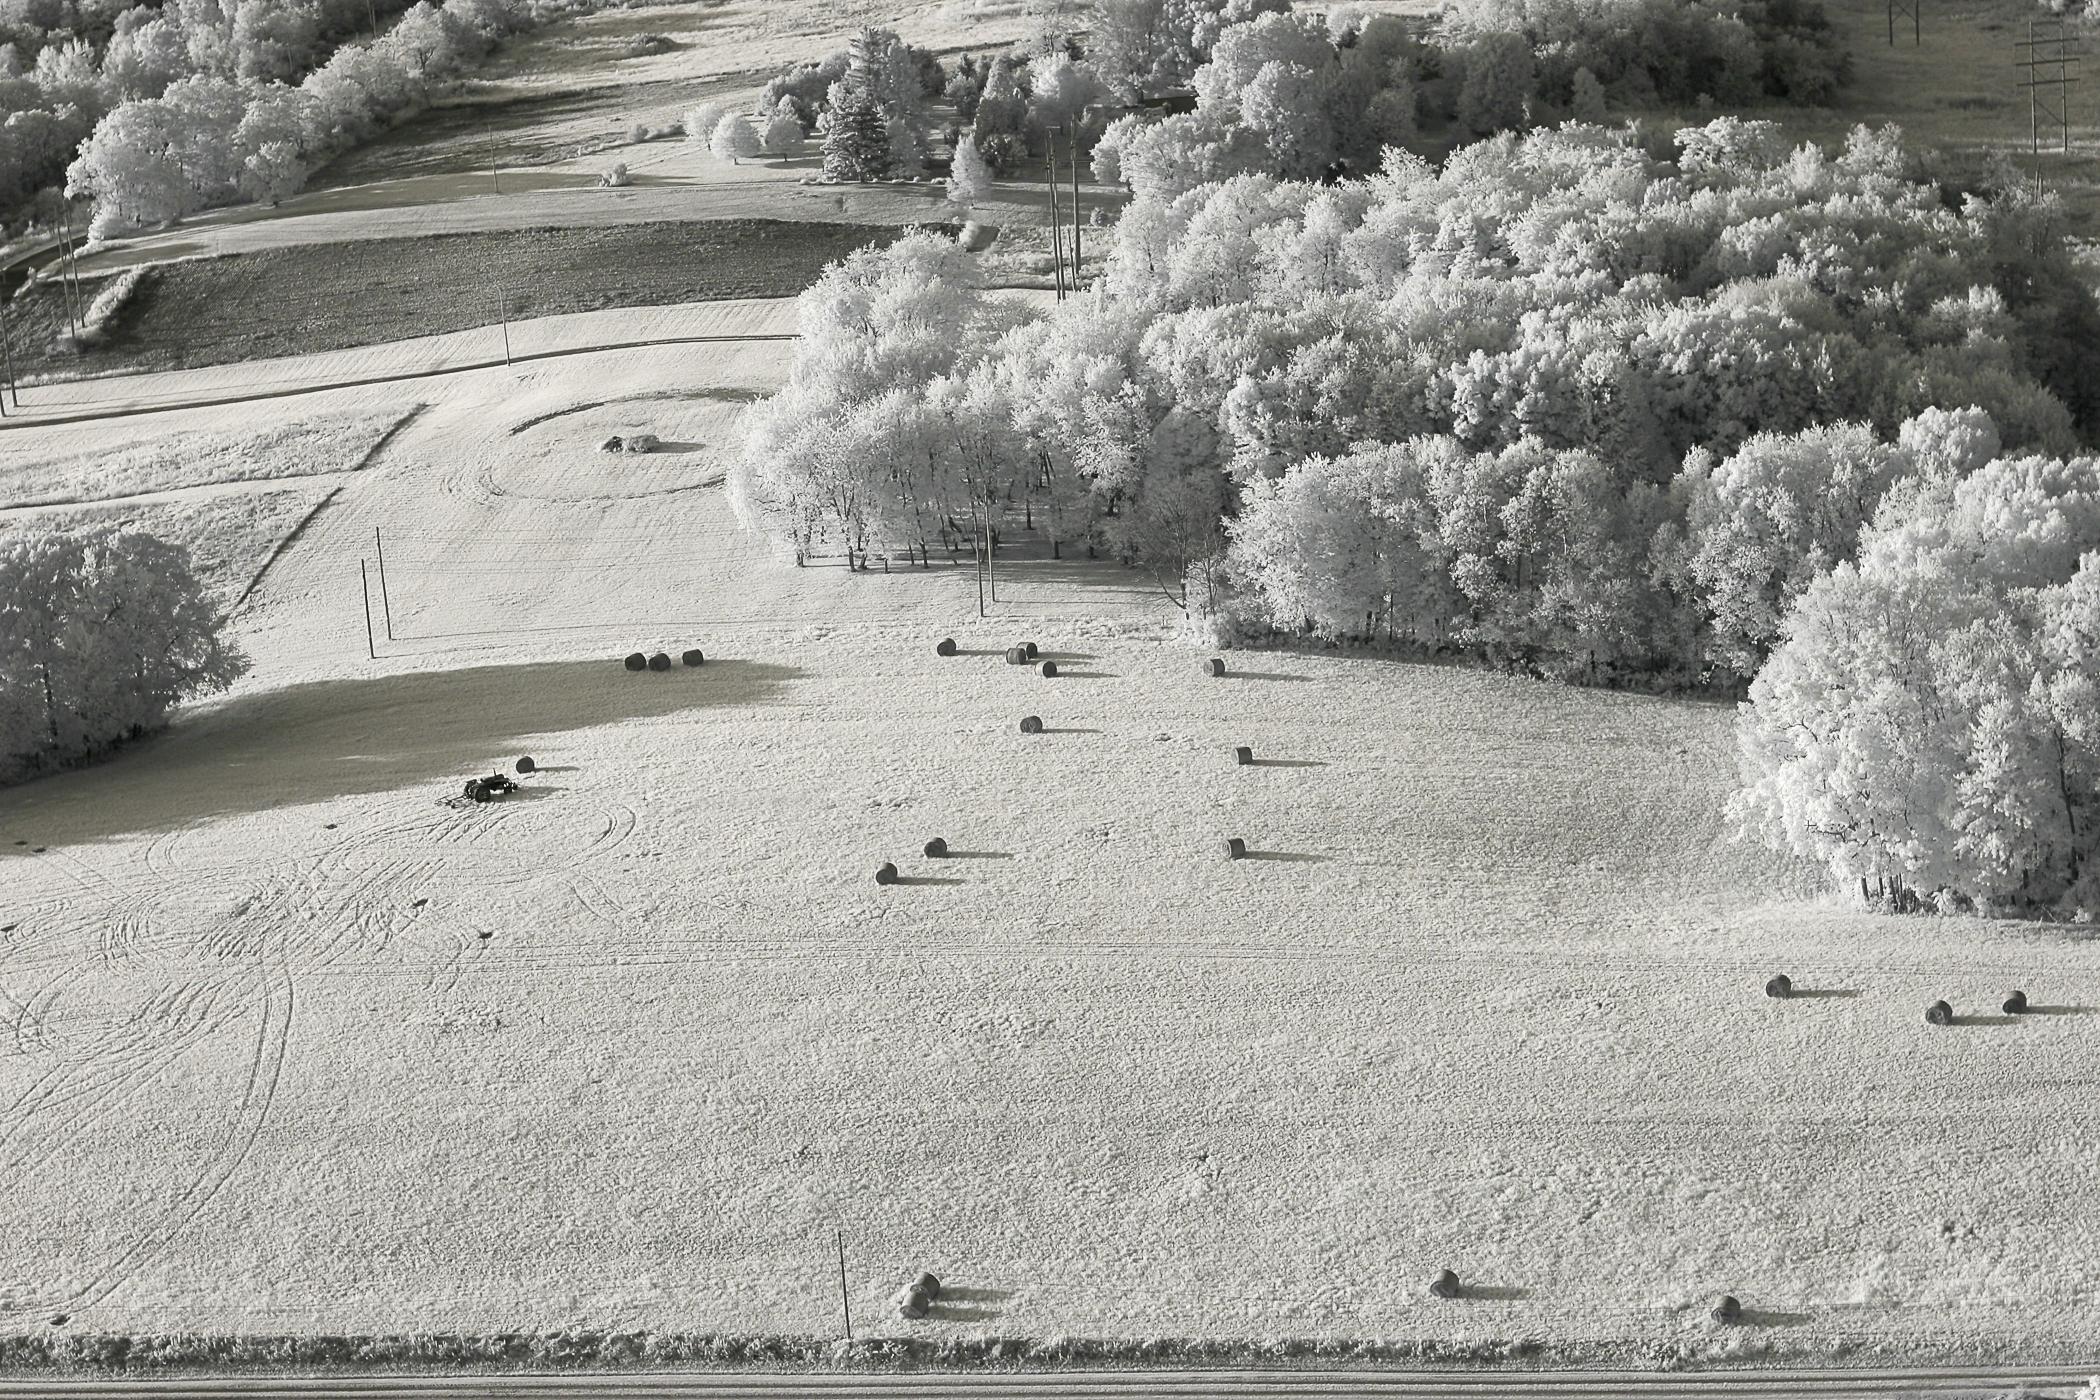 KendallInfraredAerial-13.jpg